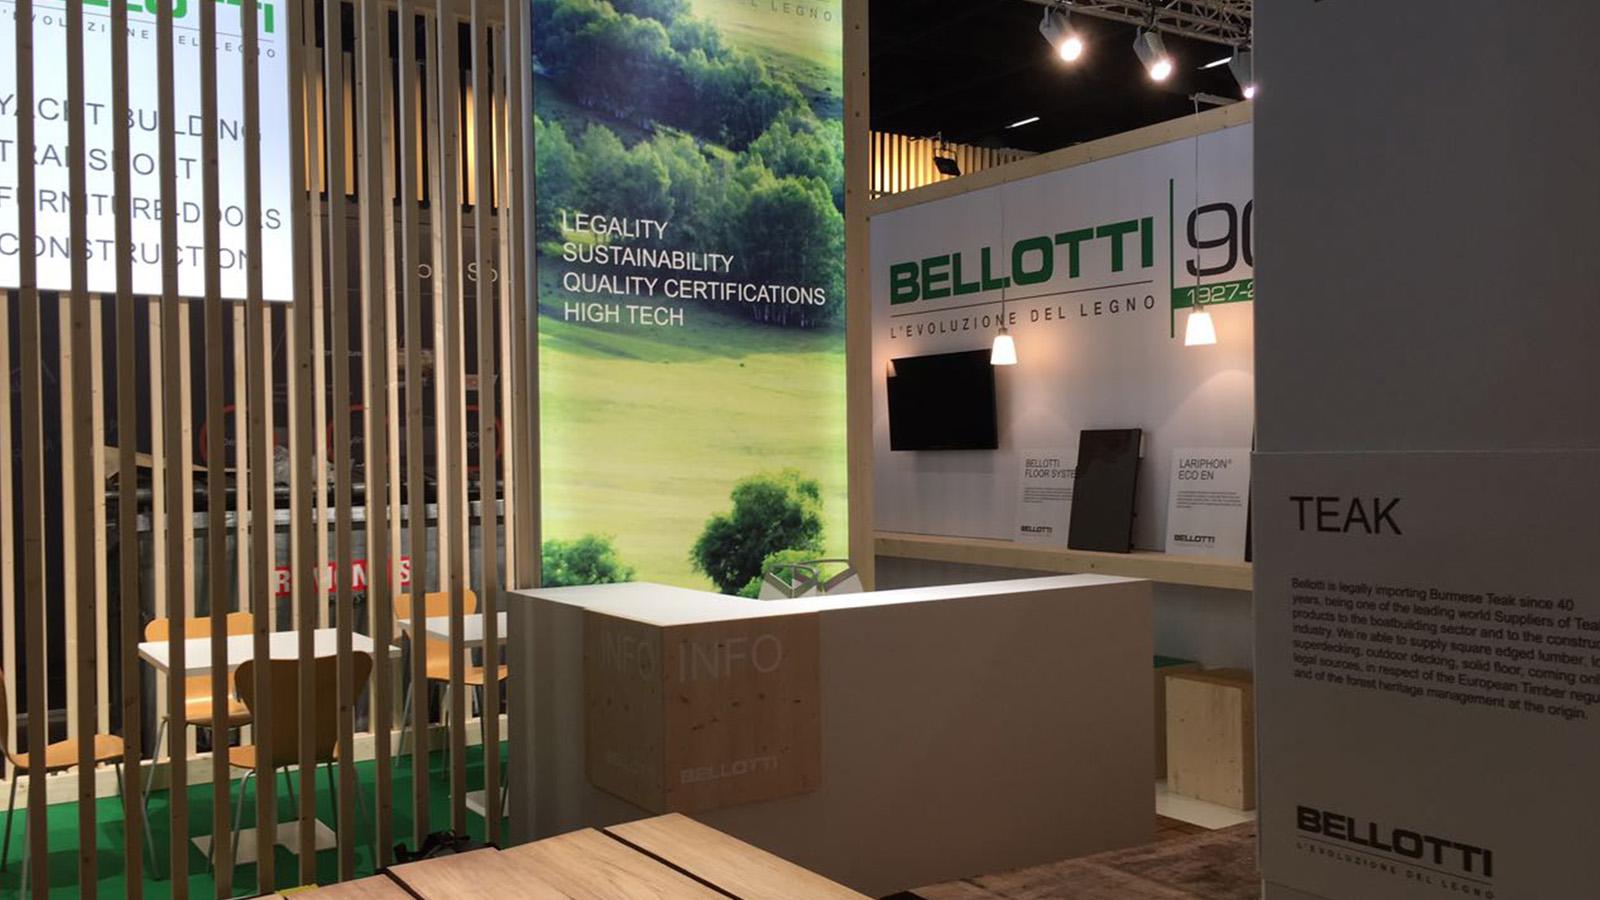 bellotti-interzum-2017-teak